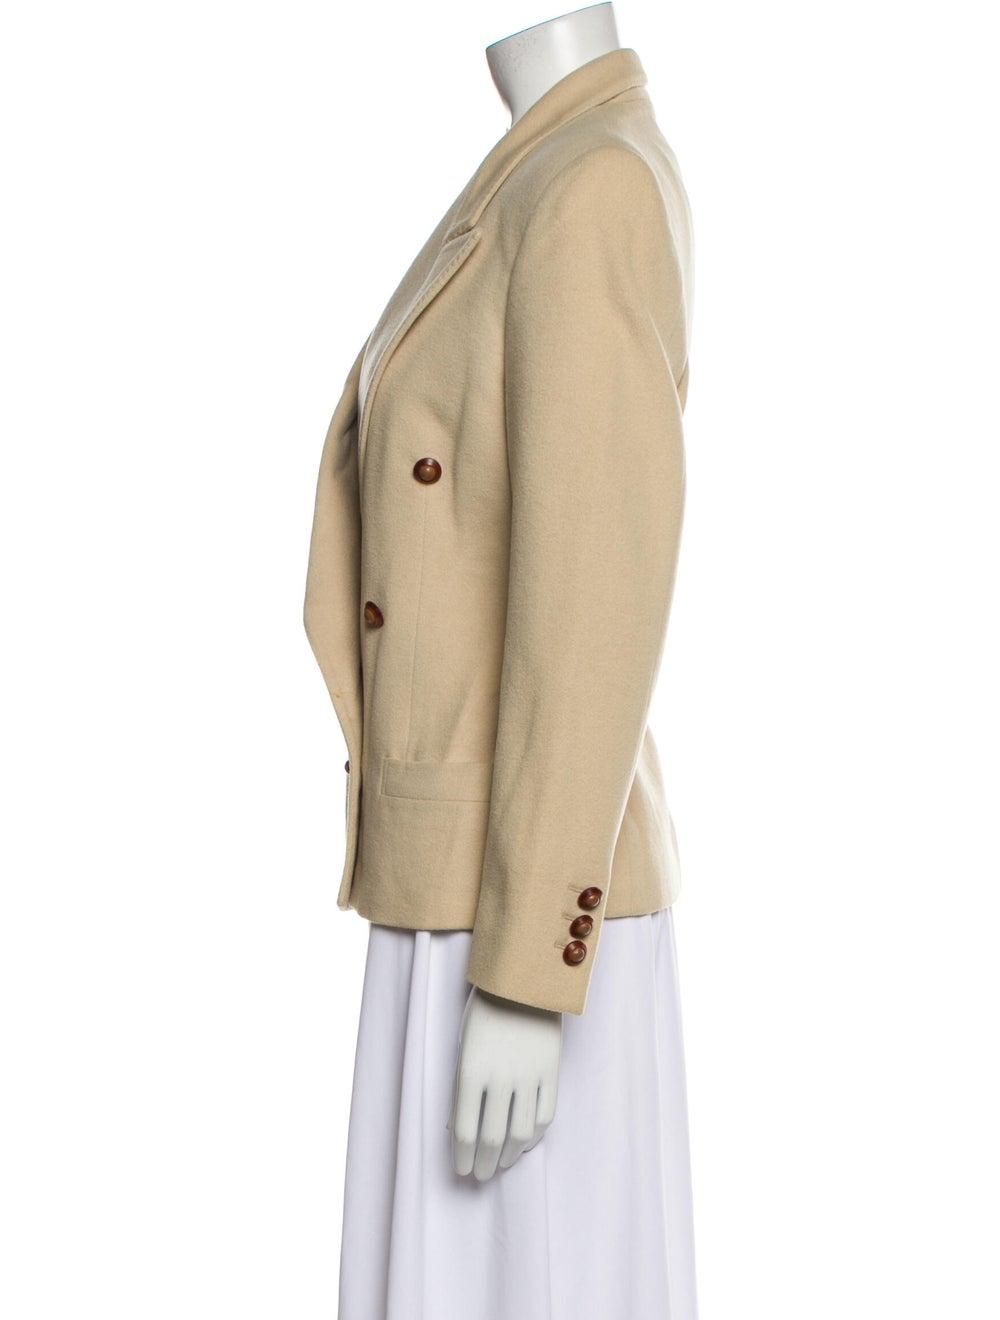 Gianni Versace Blazer - image 2